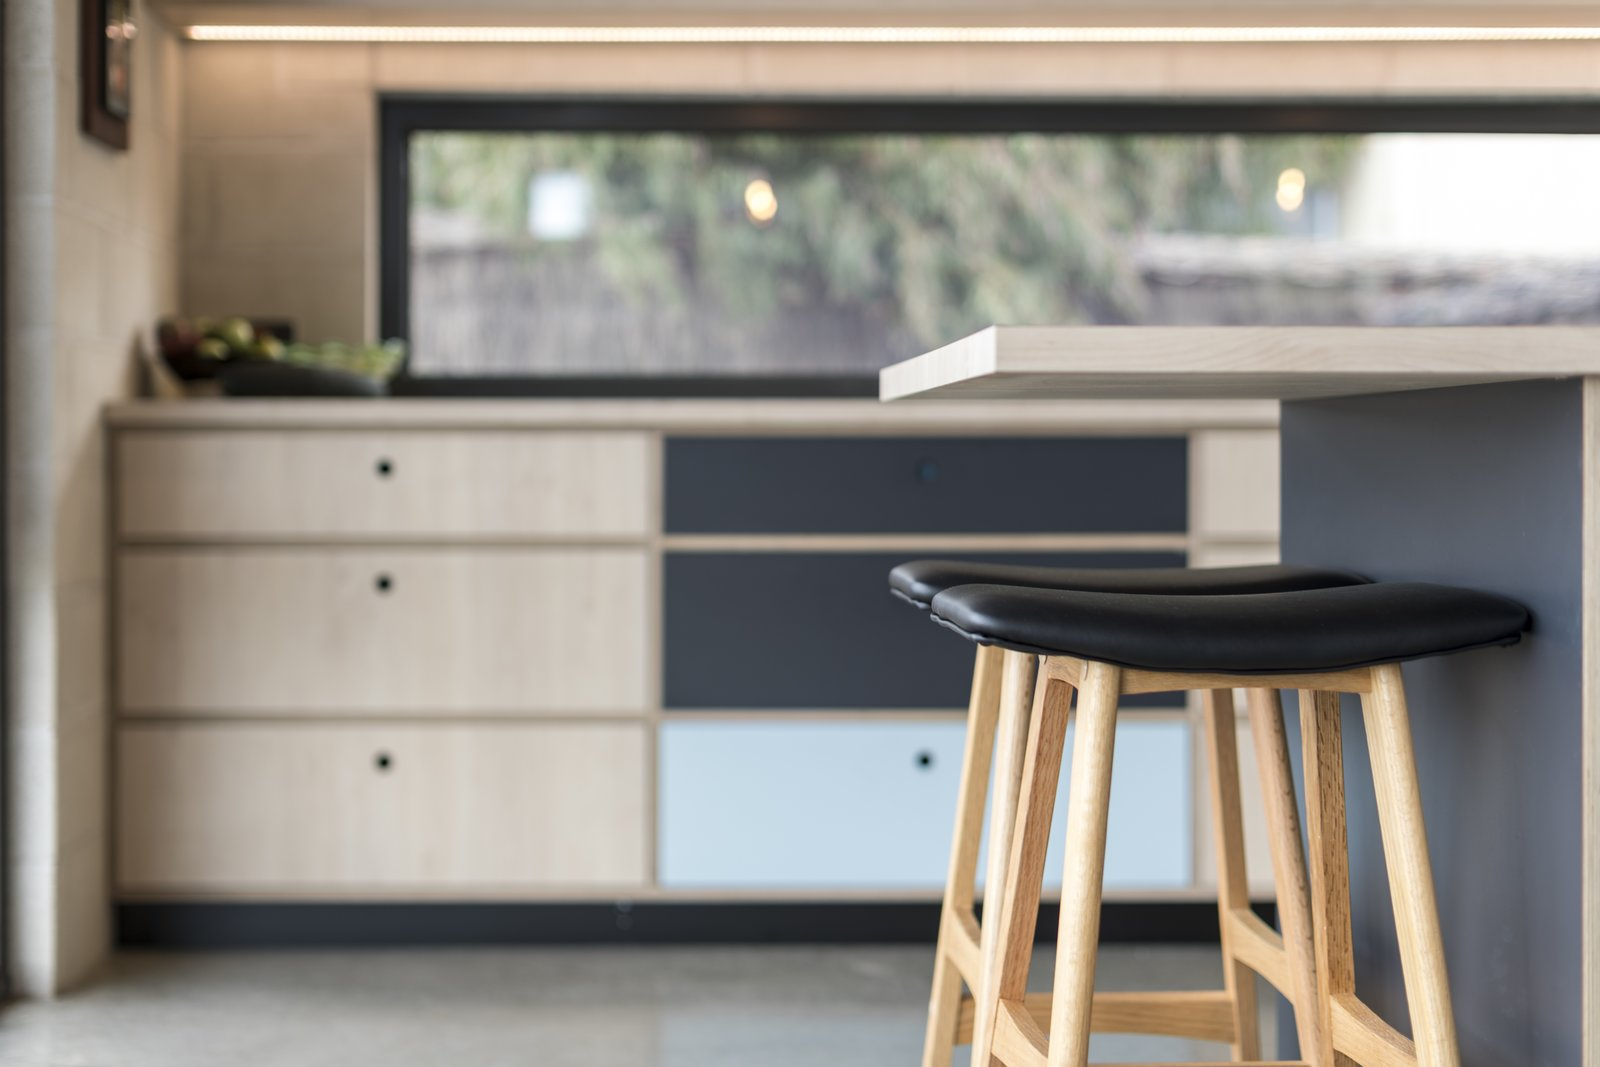 Kitchen, Laminate Cabinet, Brick Backsplashe, Laminate Counter, and Concrete Floor Kitchen bench   The Golf Course House by Bespoke Architects